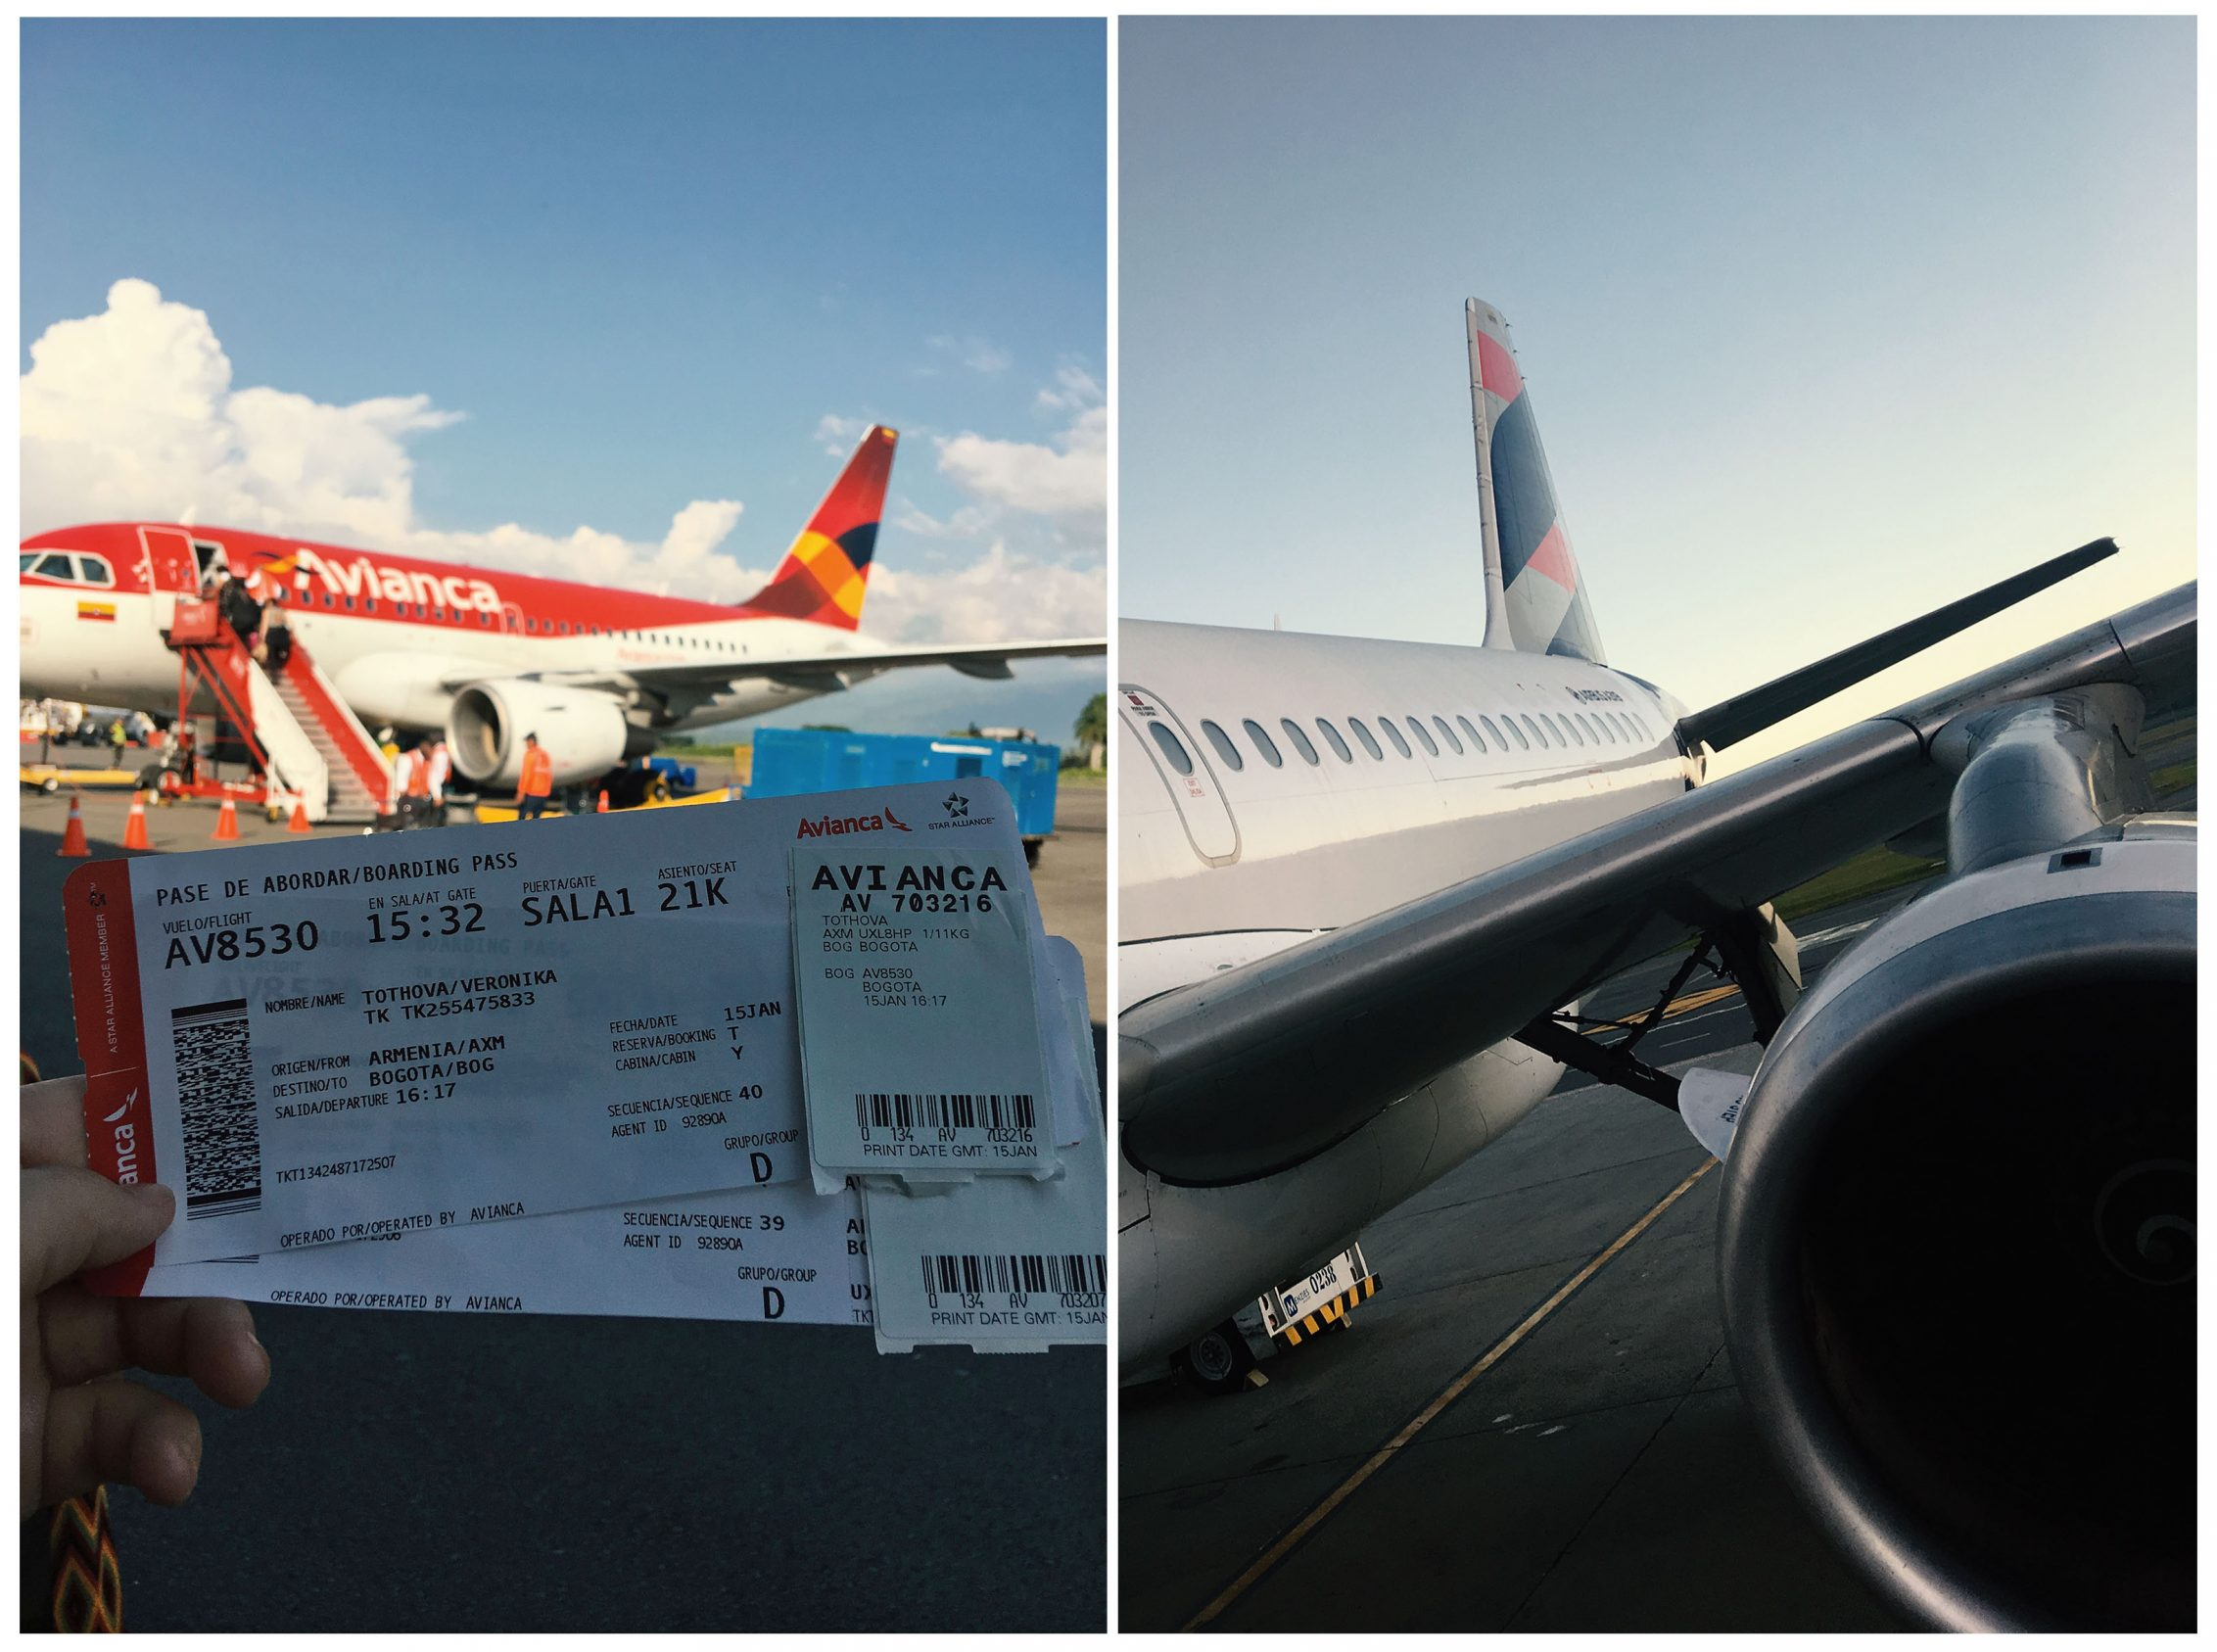 Dovolenka v Kolumbii - letenky do Kolumbie